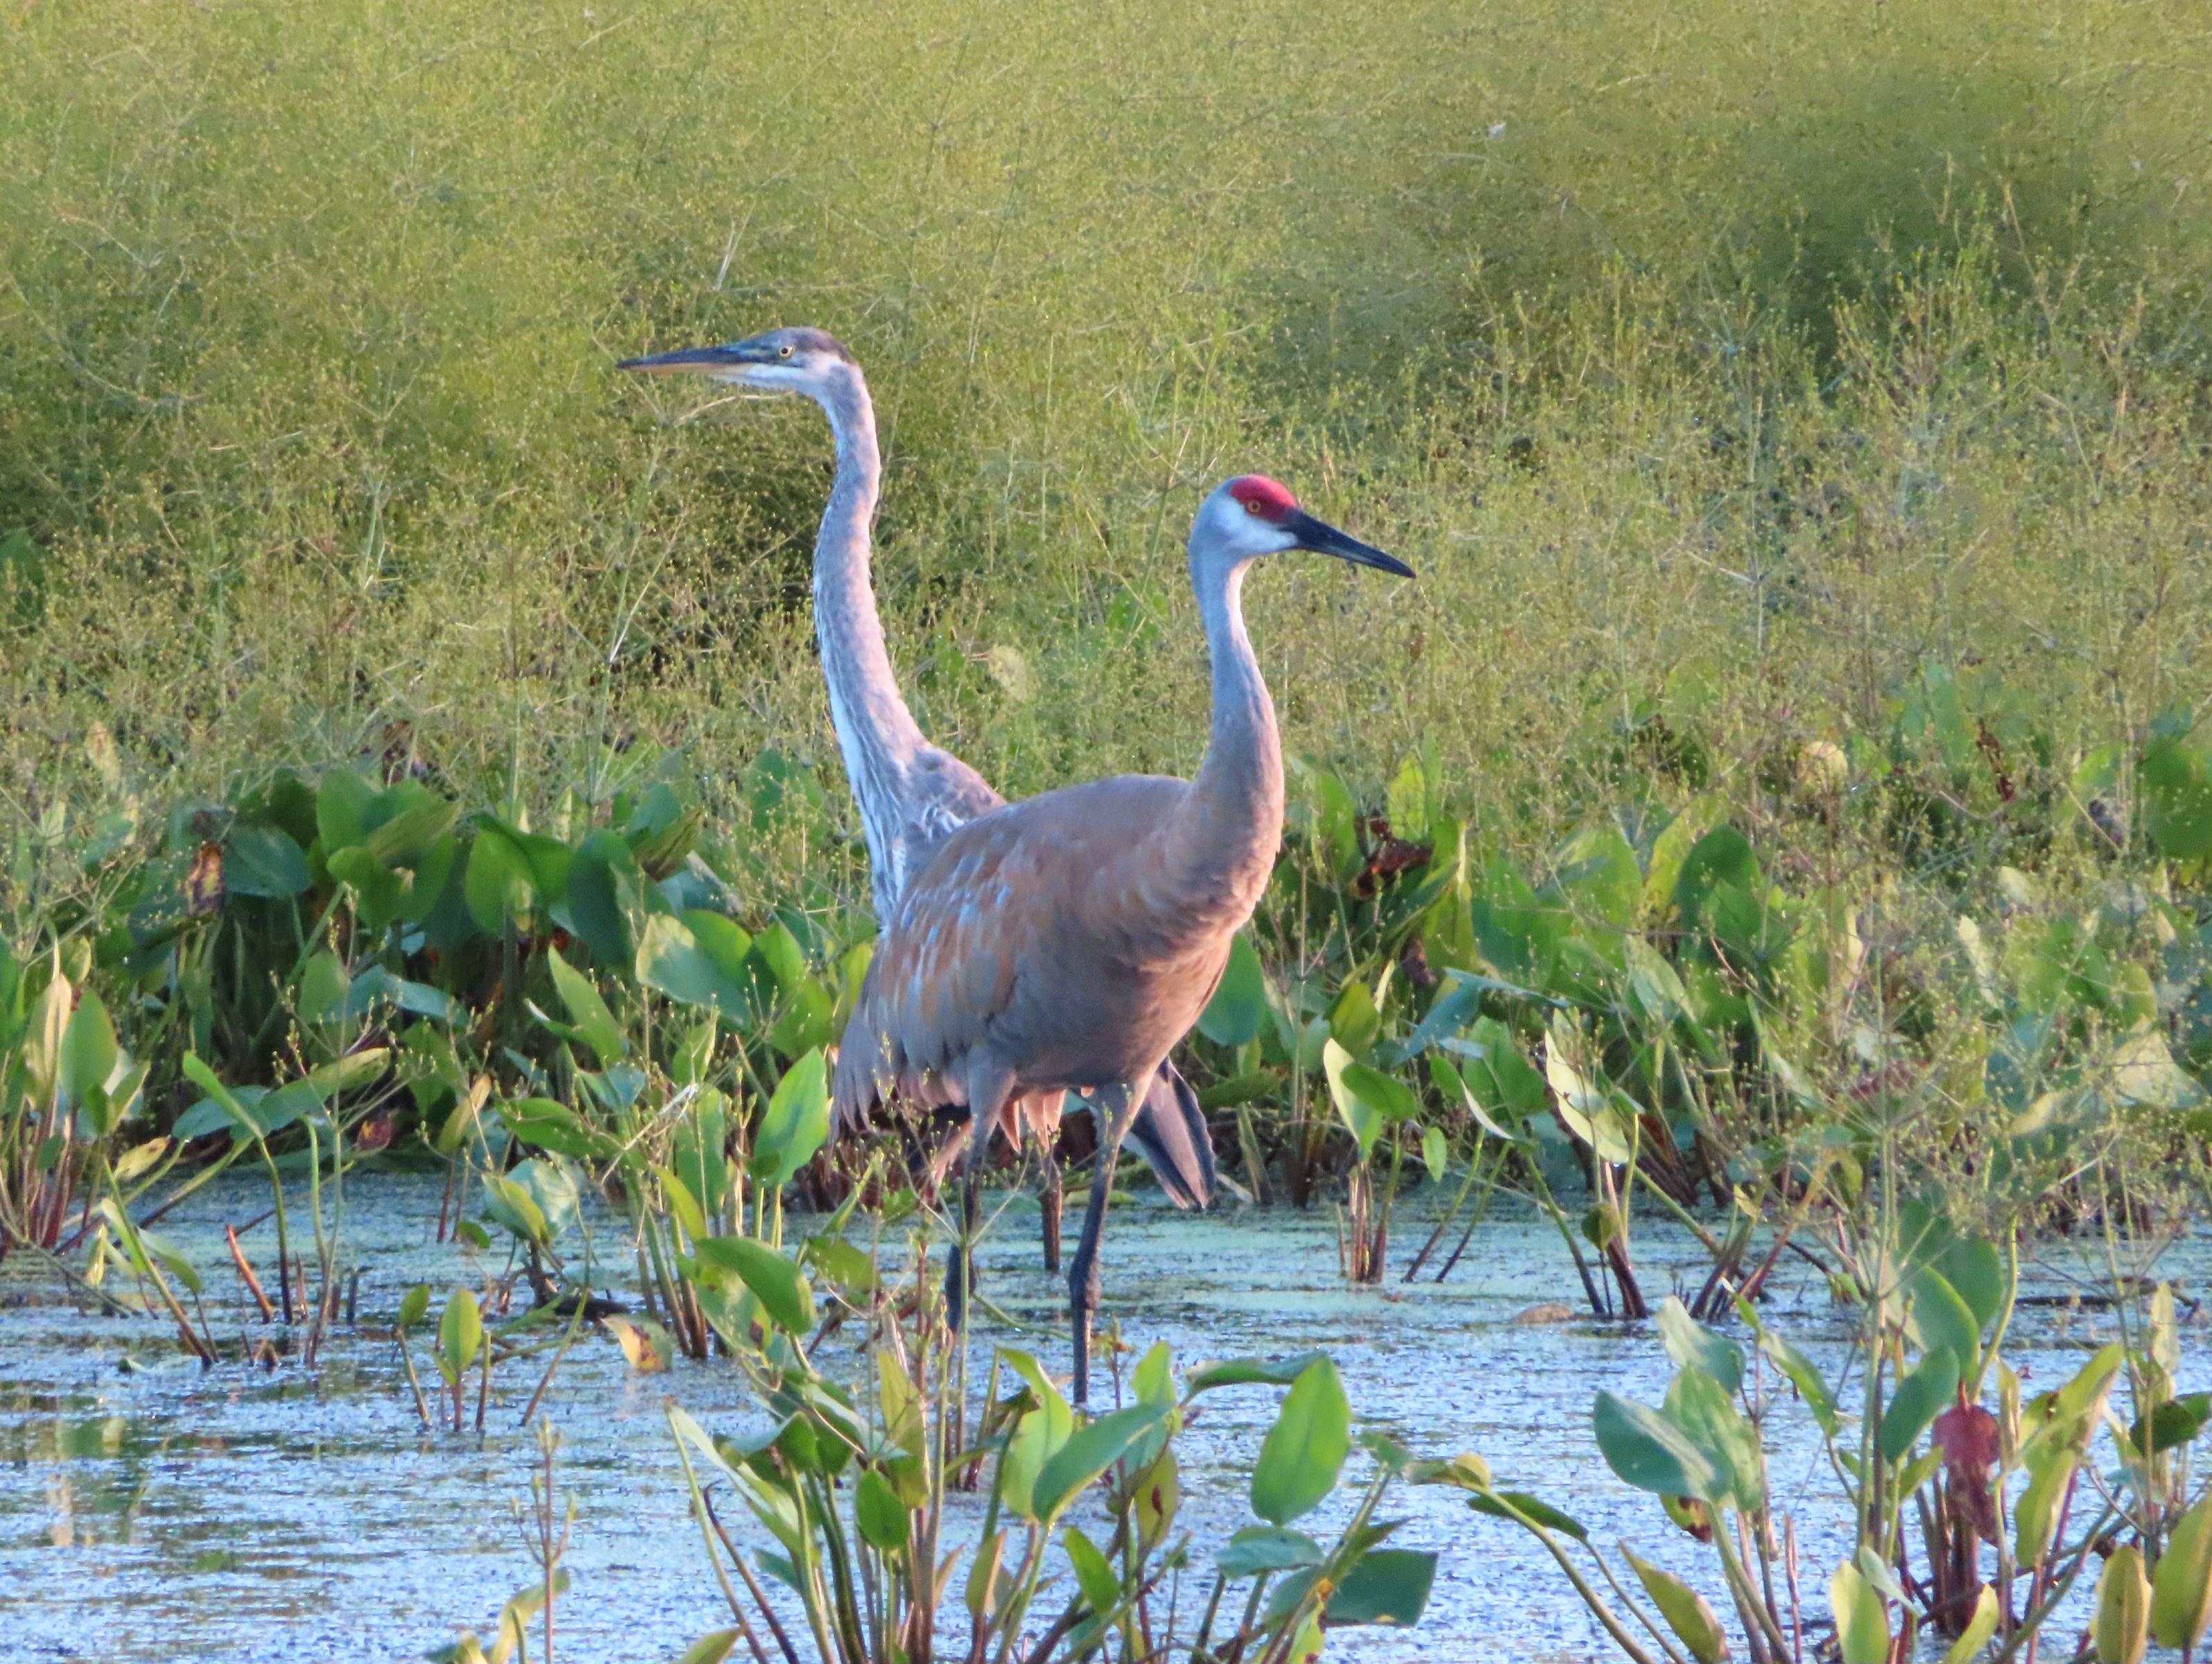 08/11/2020 Great Blue Heron and Sandhill Crane